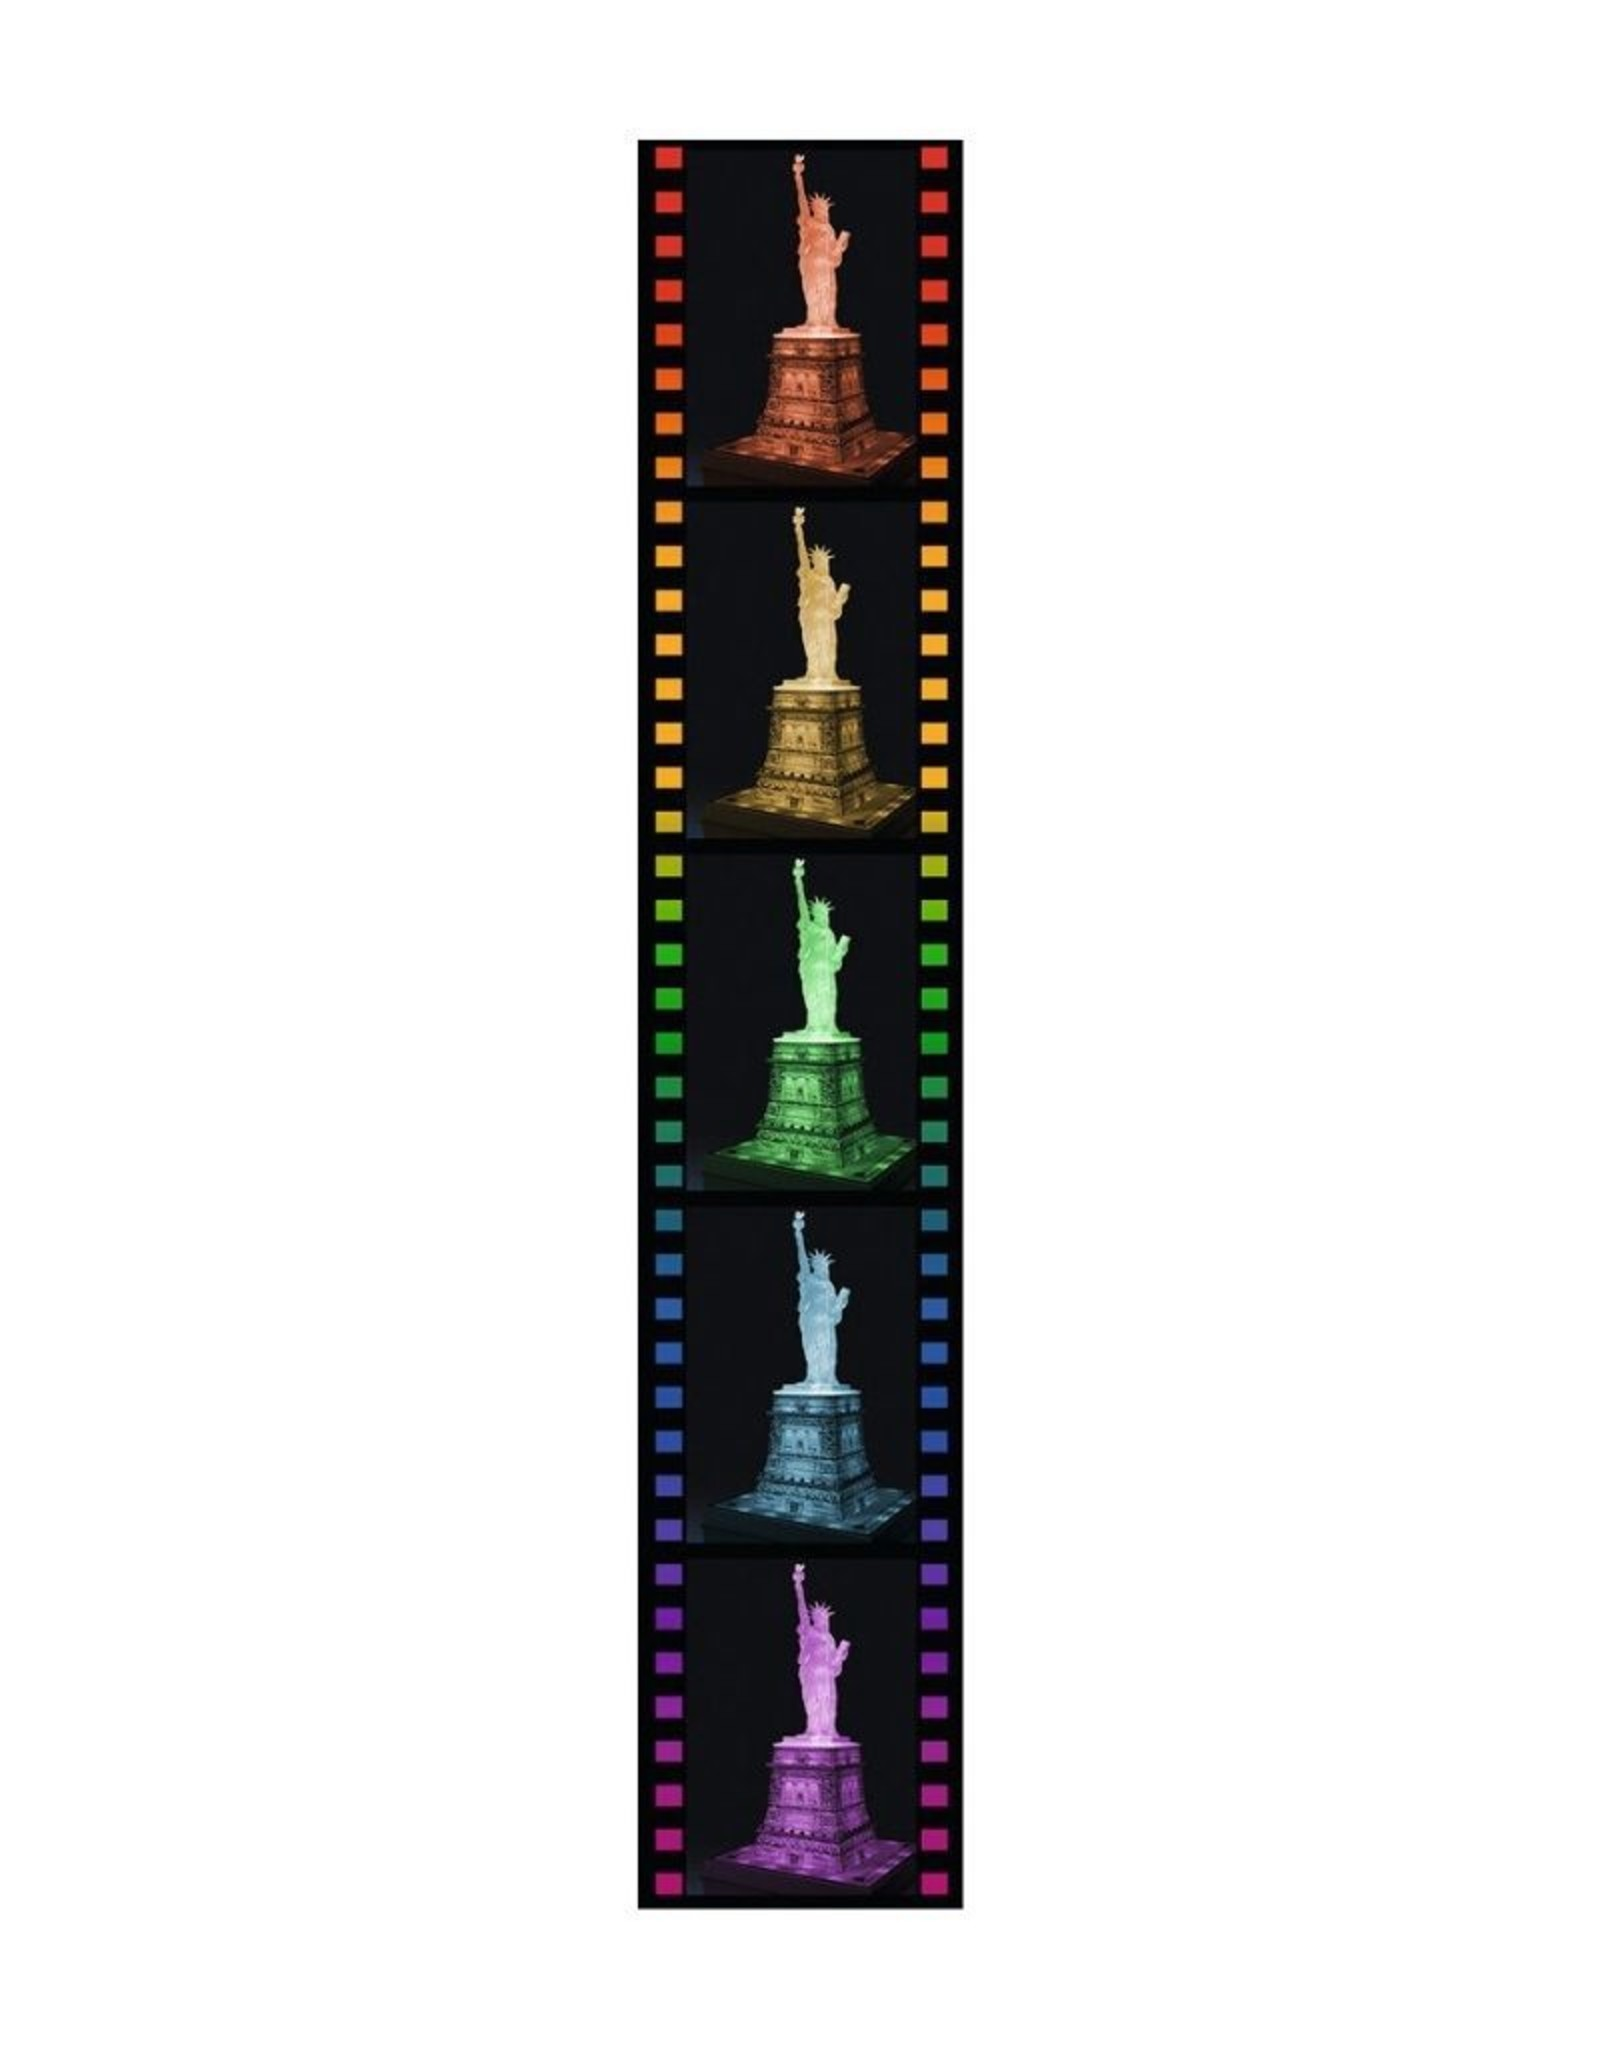 Ravensburger 12596 Statue of Liberty Night Edition